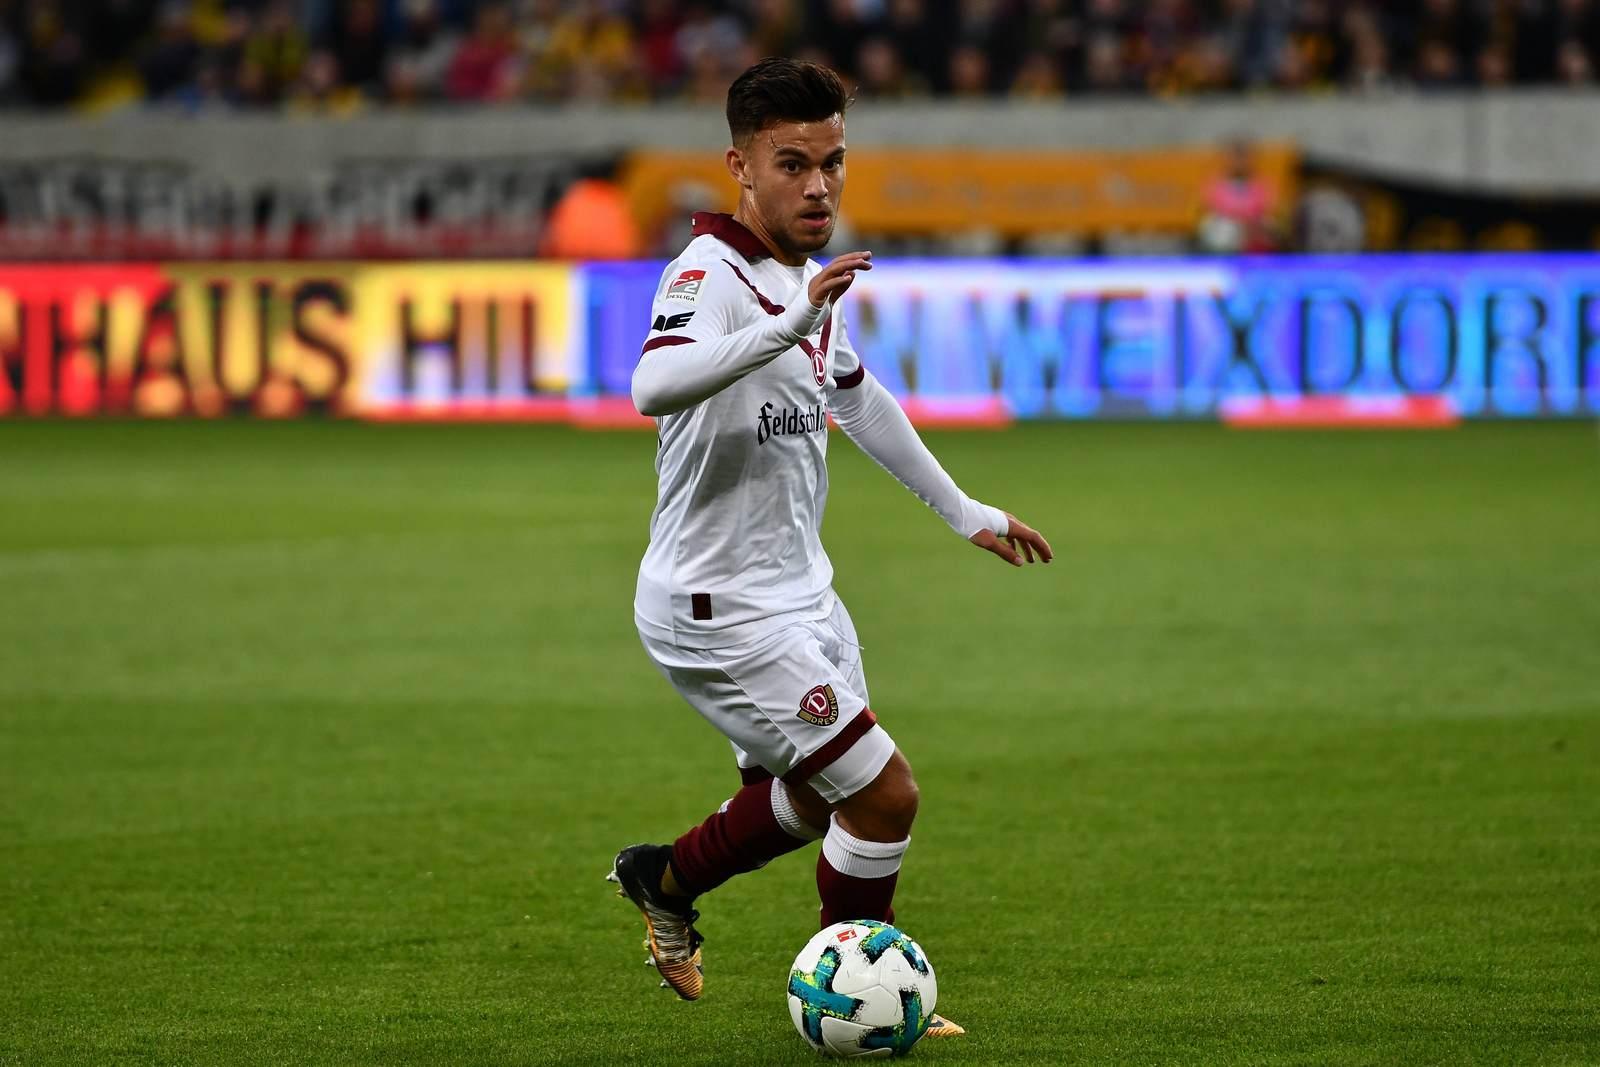 Sascha Horvath am Ball für Dynamo Dresden.